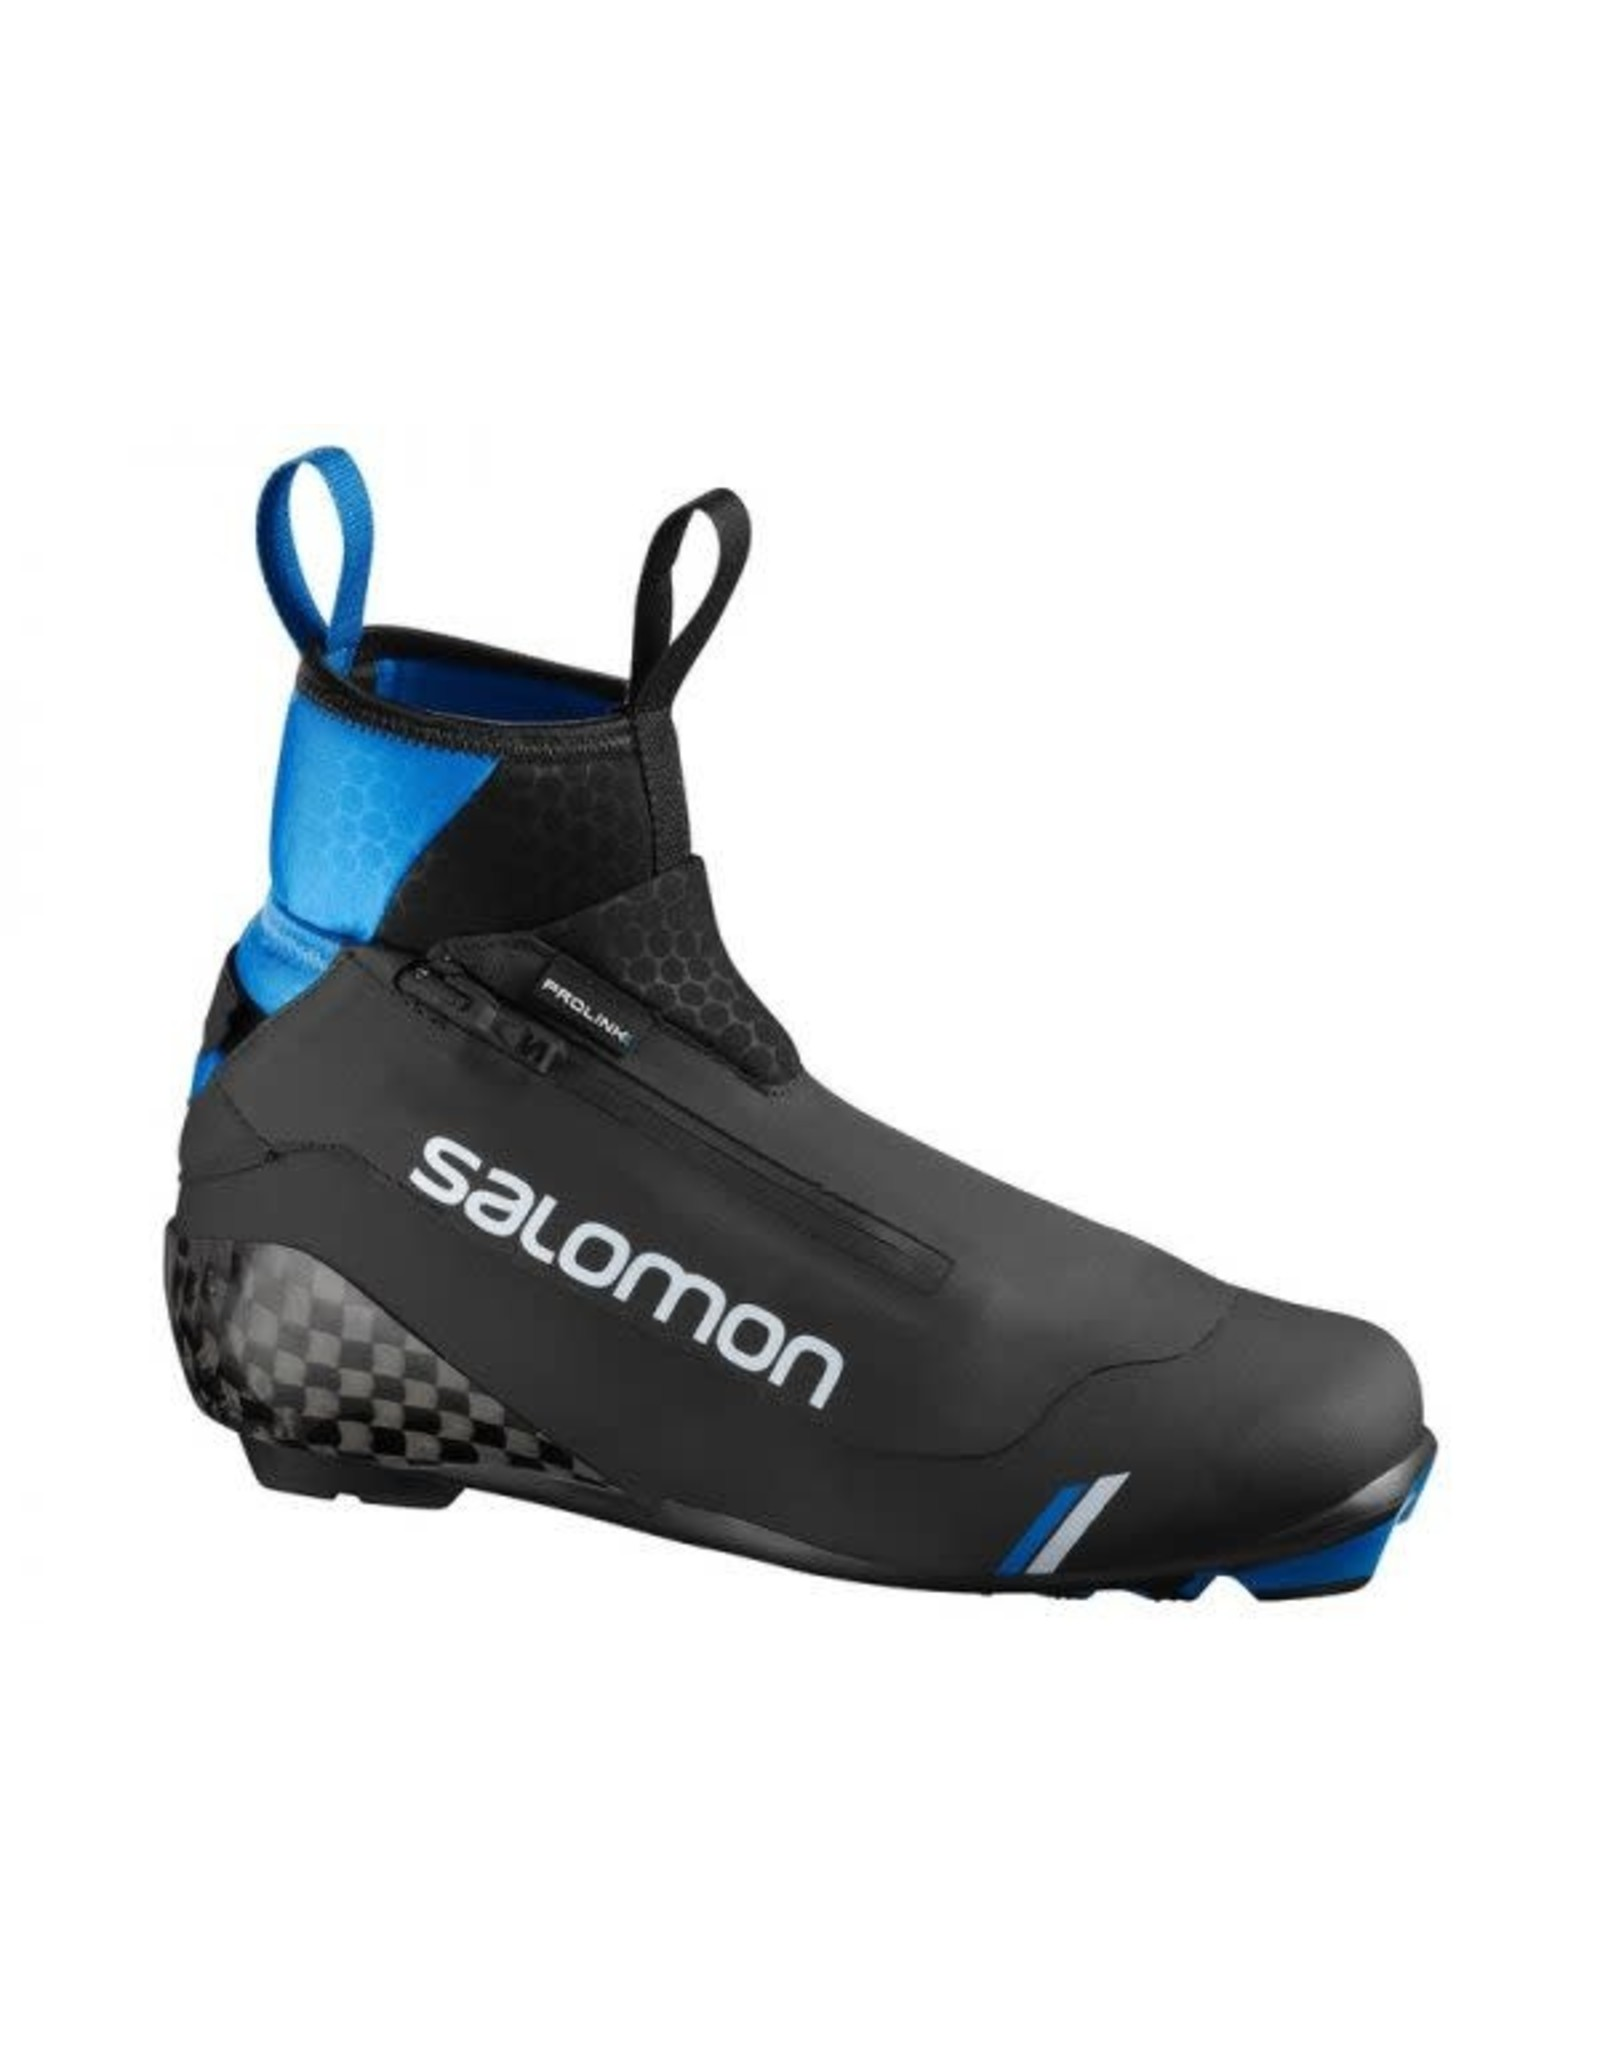 SALOMON '20 SALOMON, S/Race Classic, Prolink